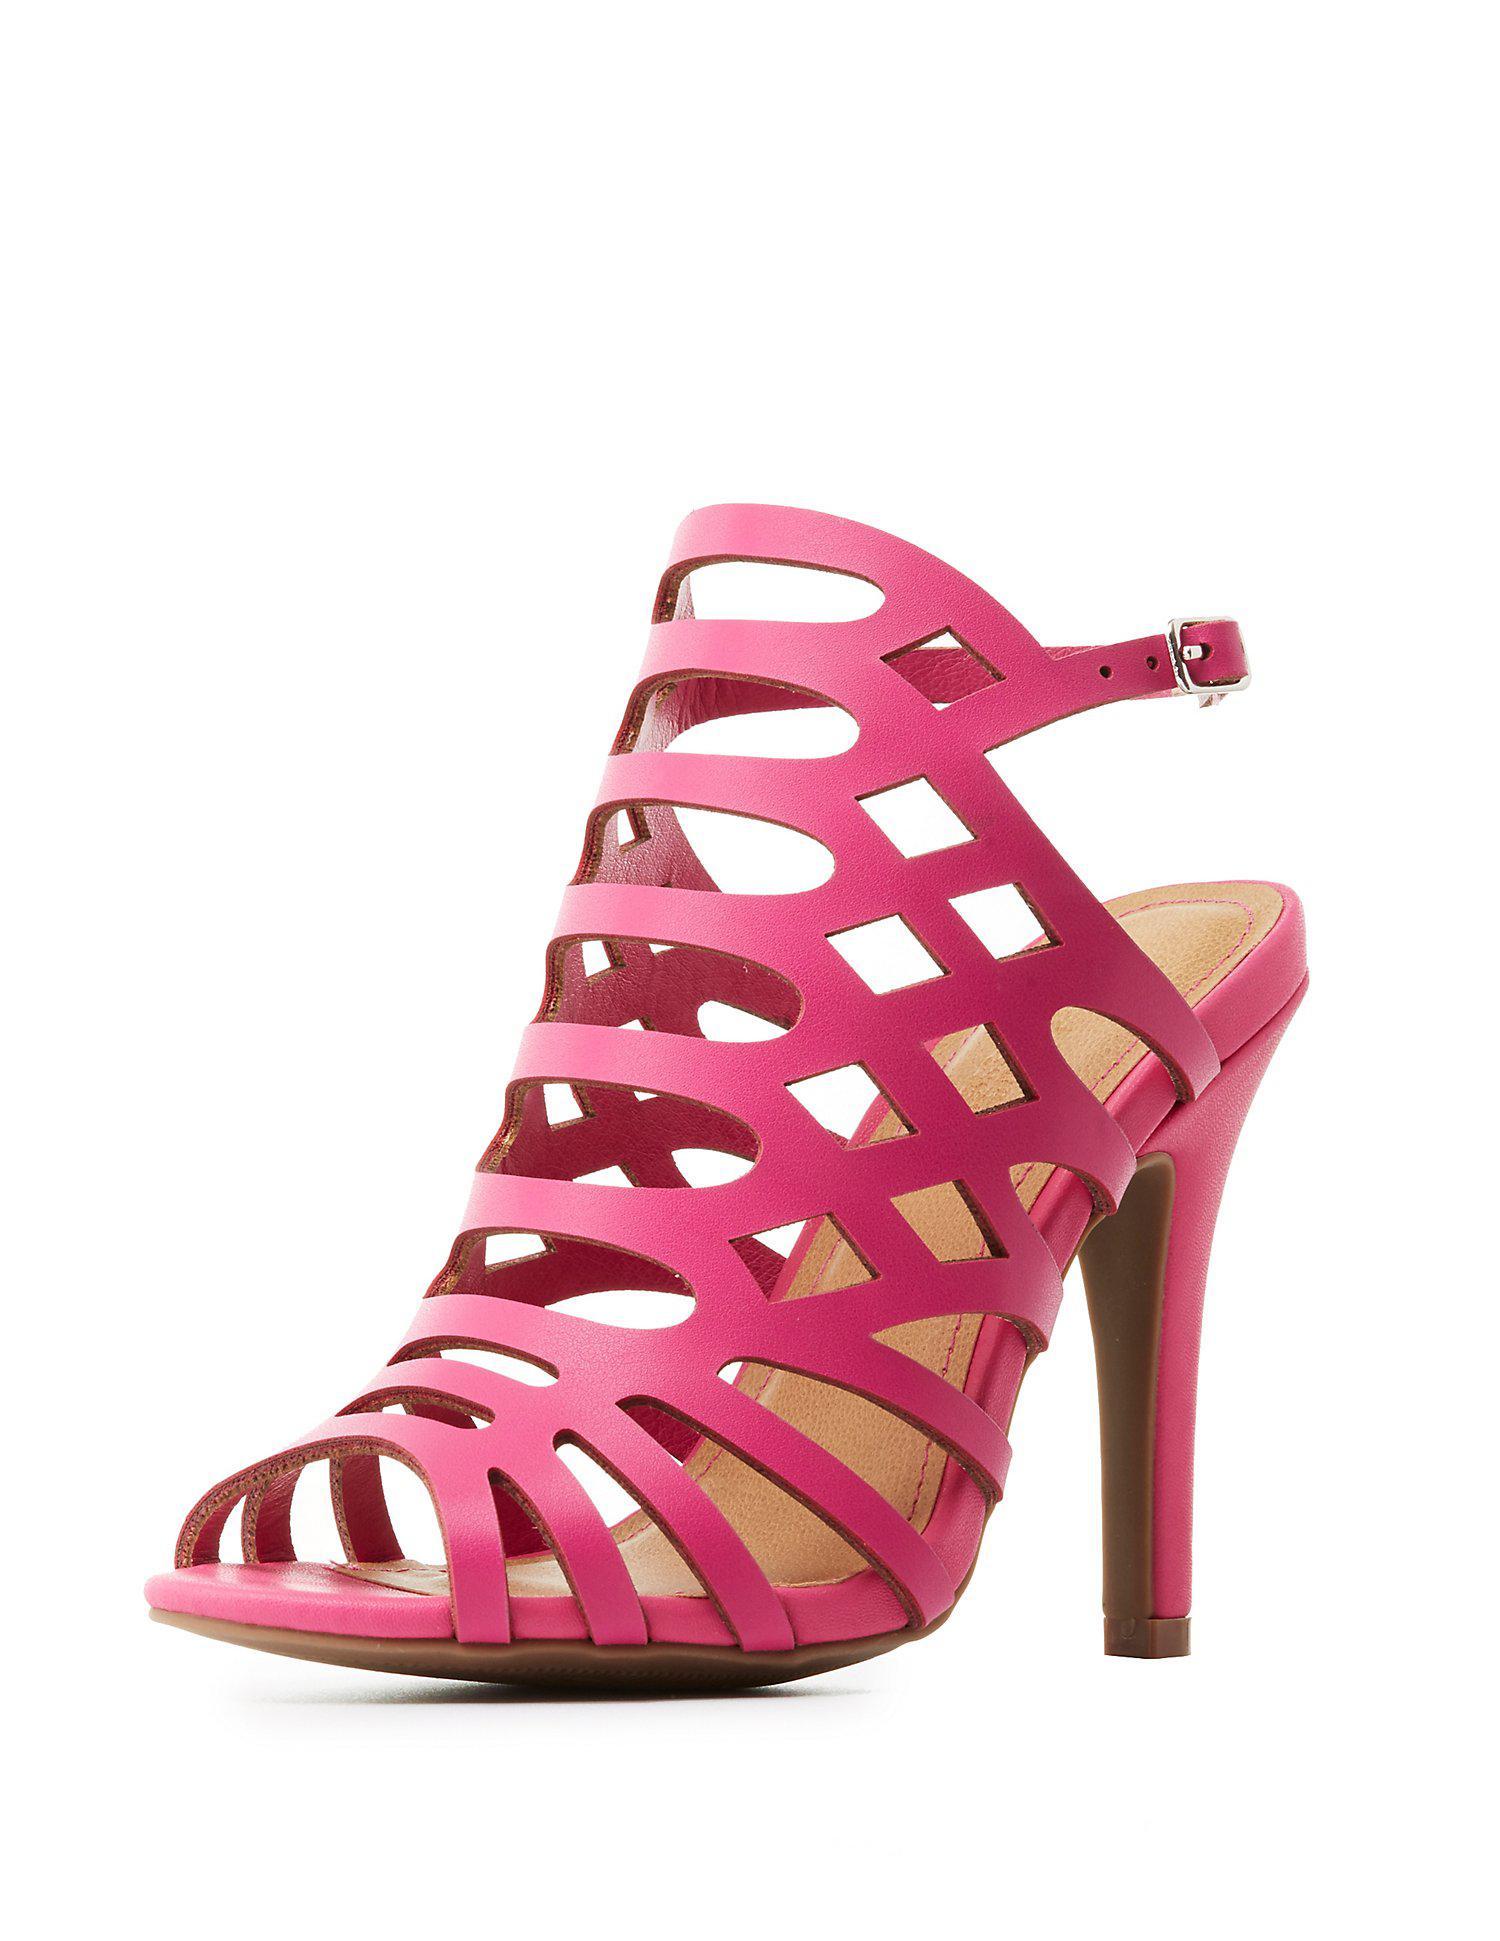 c5d239b85b58 Lyst - Charlotte Russe Wide Width Laser Cut Dress Sandals in Pink